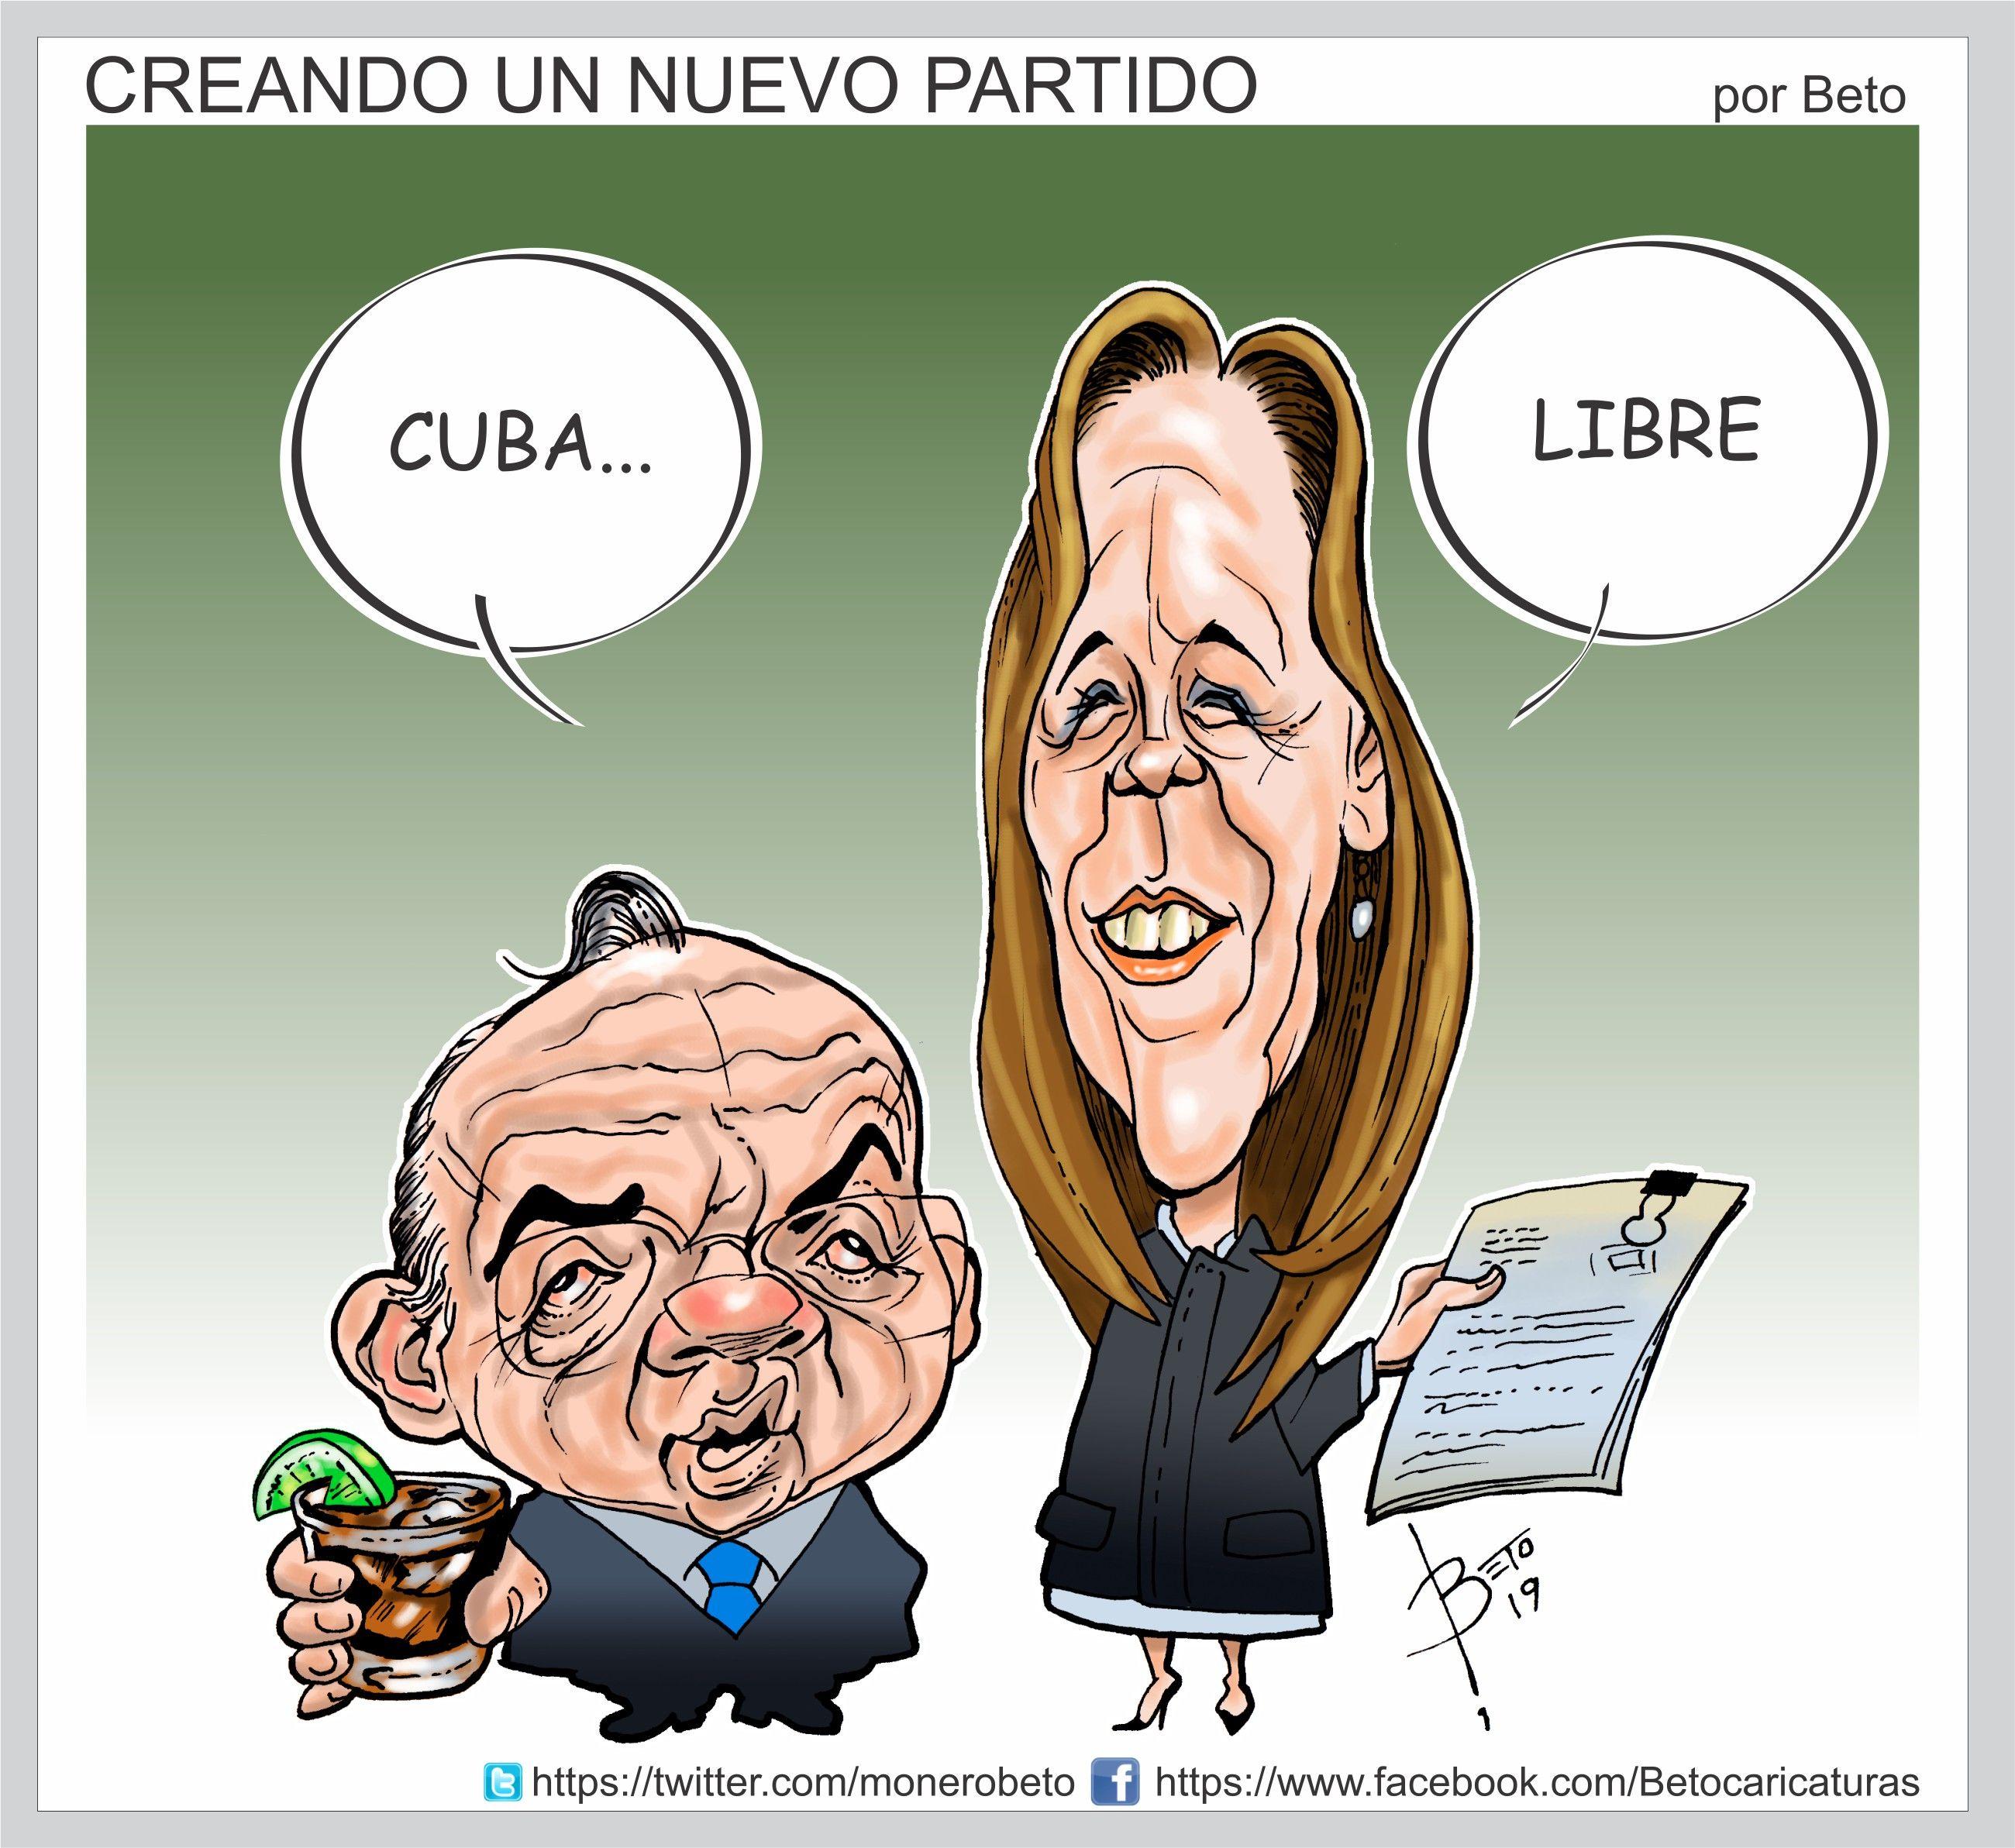 El De Hoy Felipecalderon Margaritazavala Partidospoliticos Felipe Calderon Caricaturas Politicas Calderon